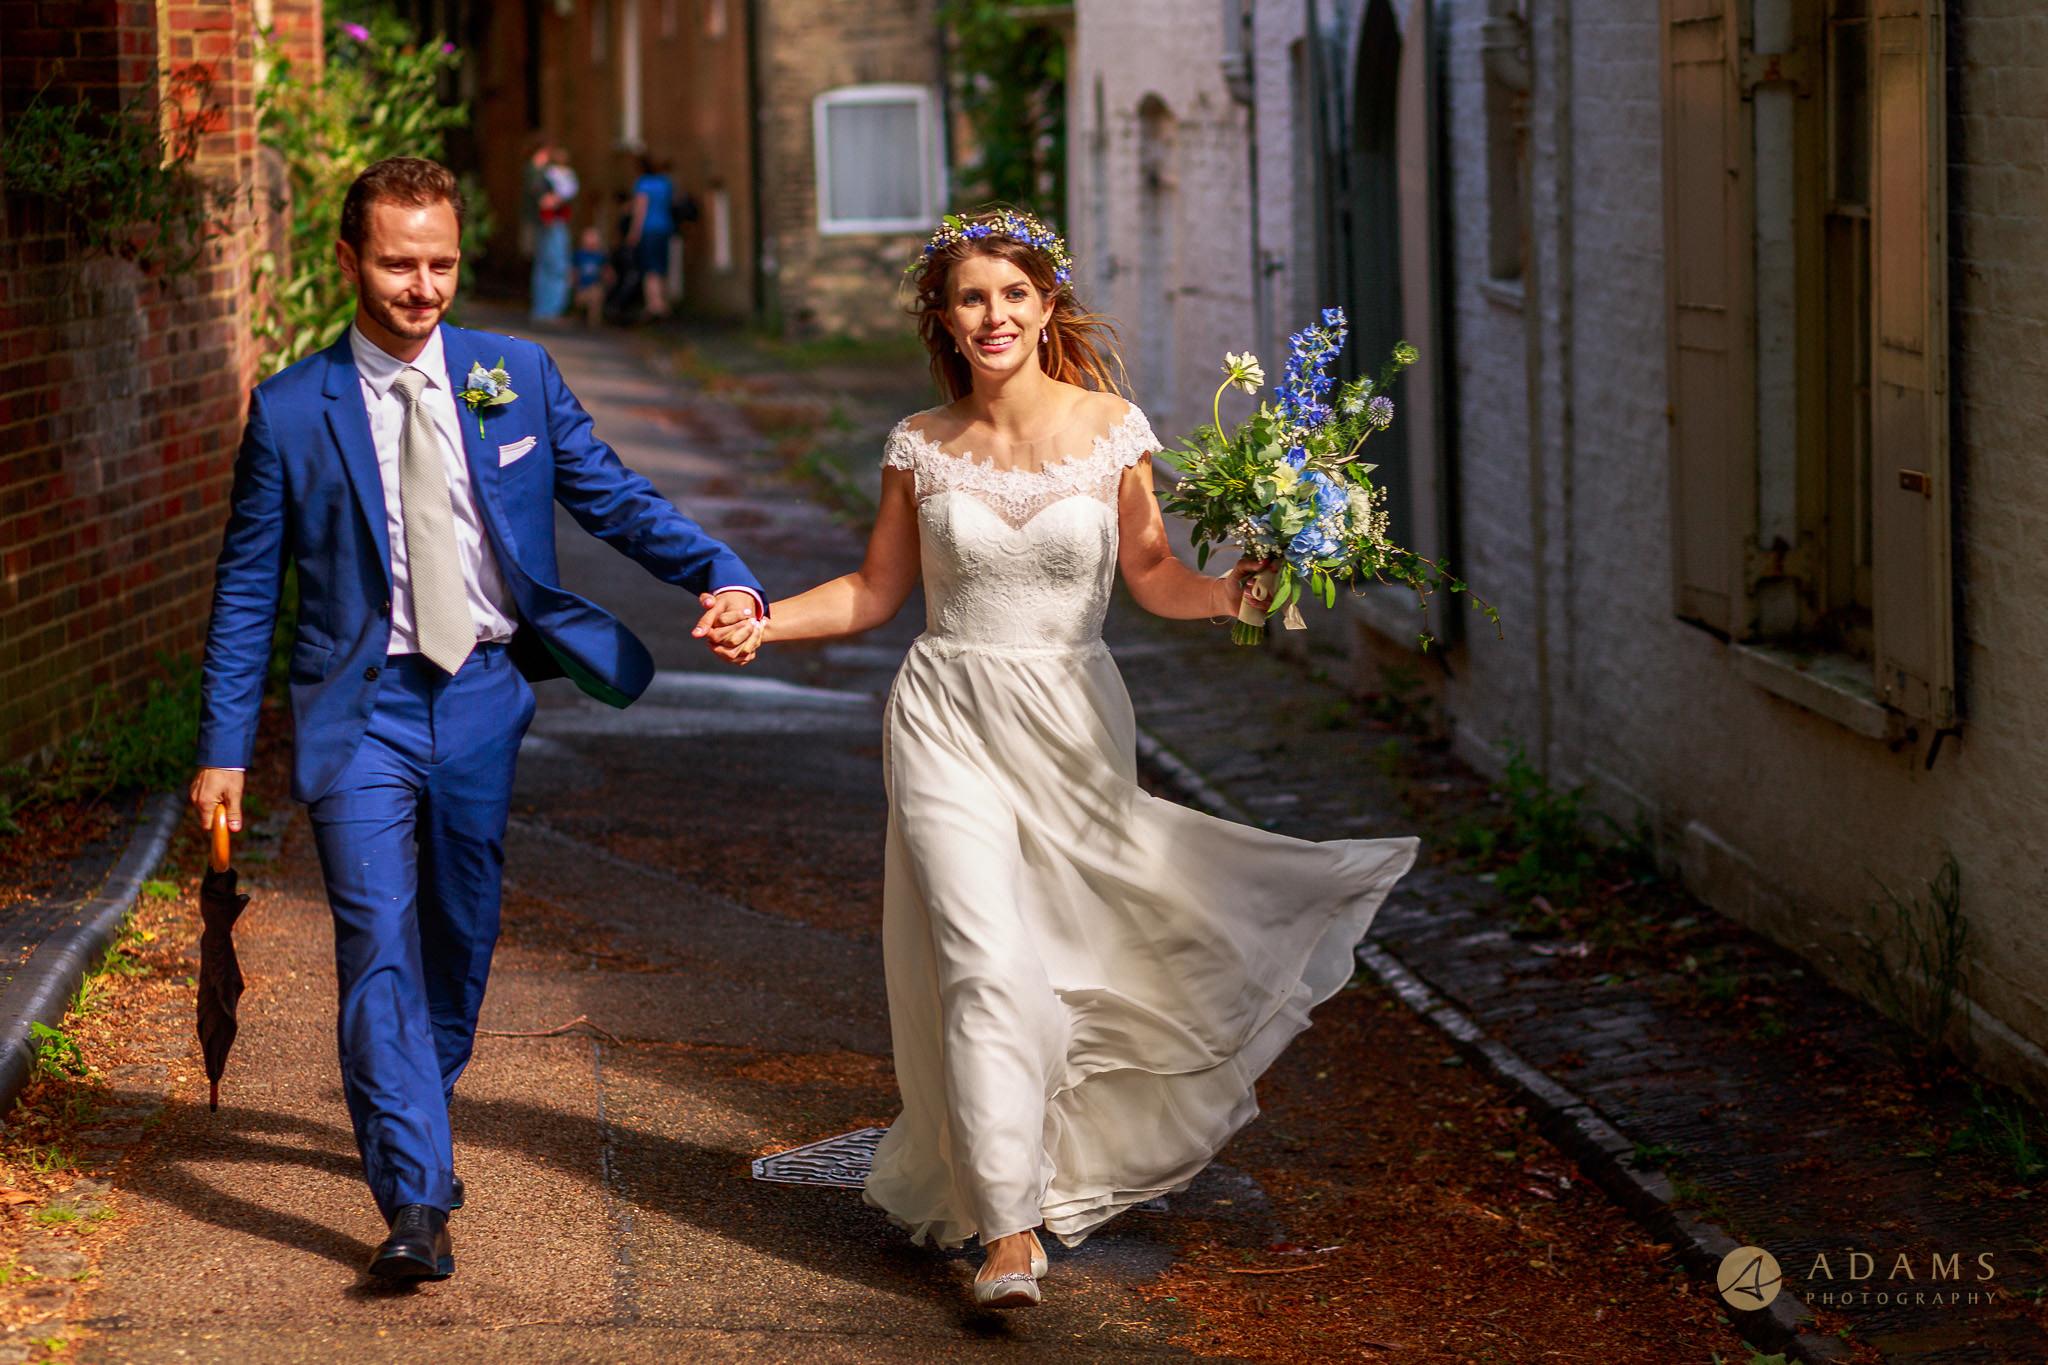 Cambridge Photographer bride and groom walking